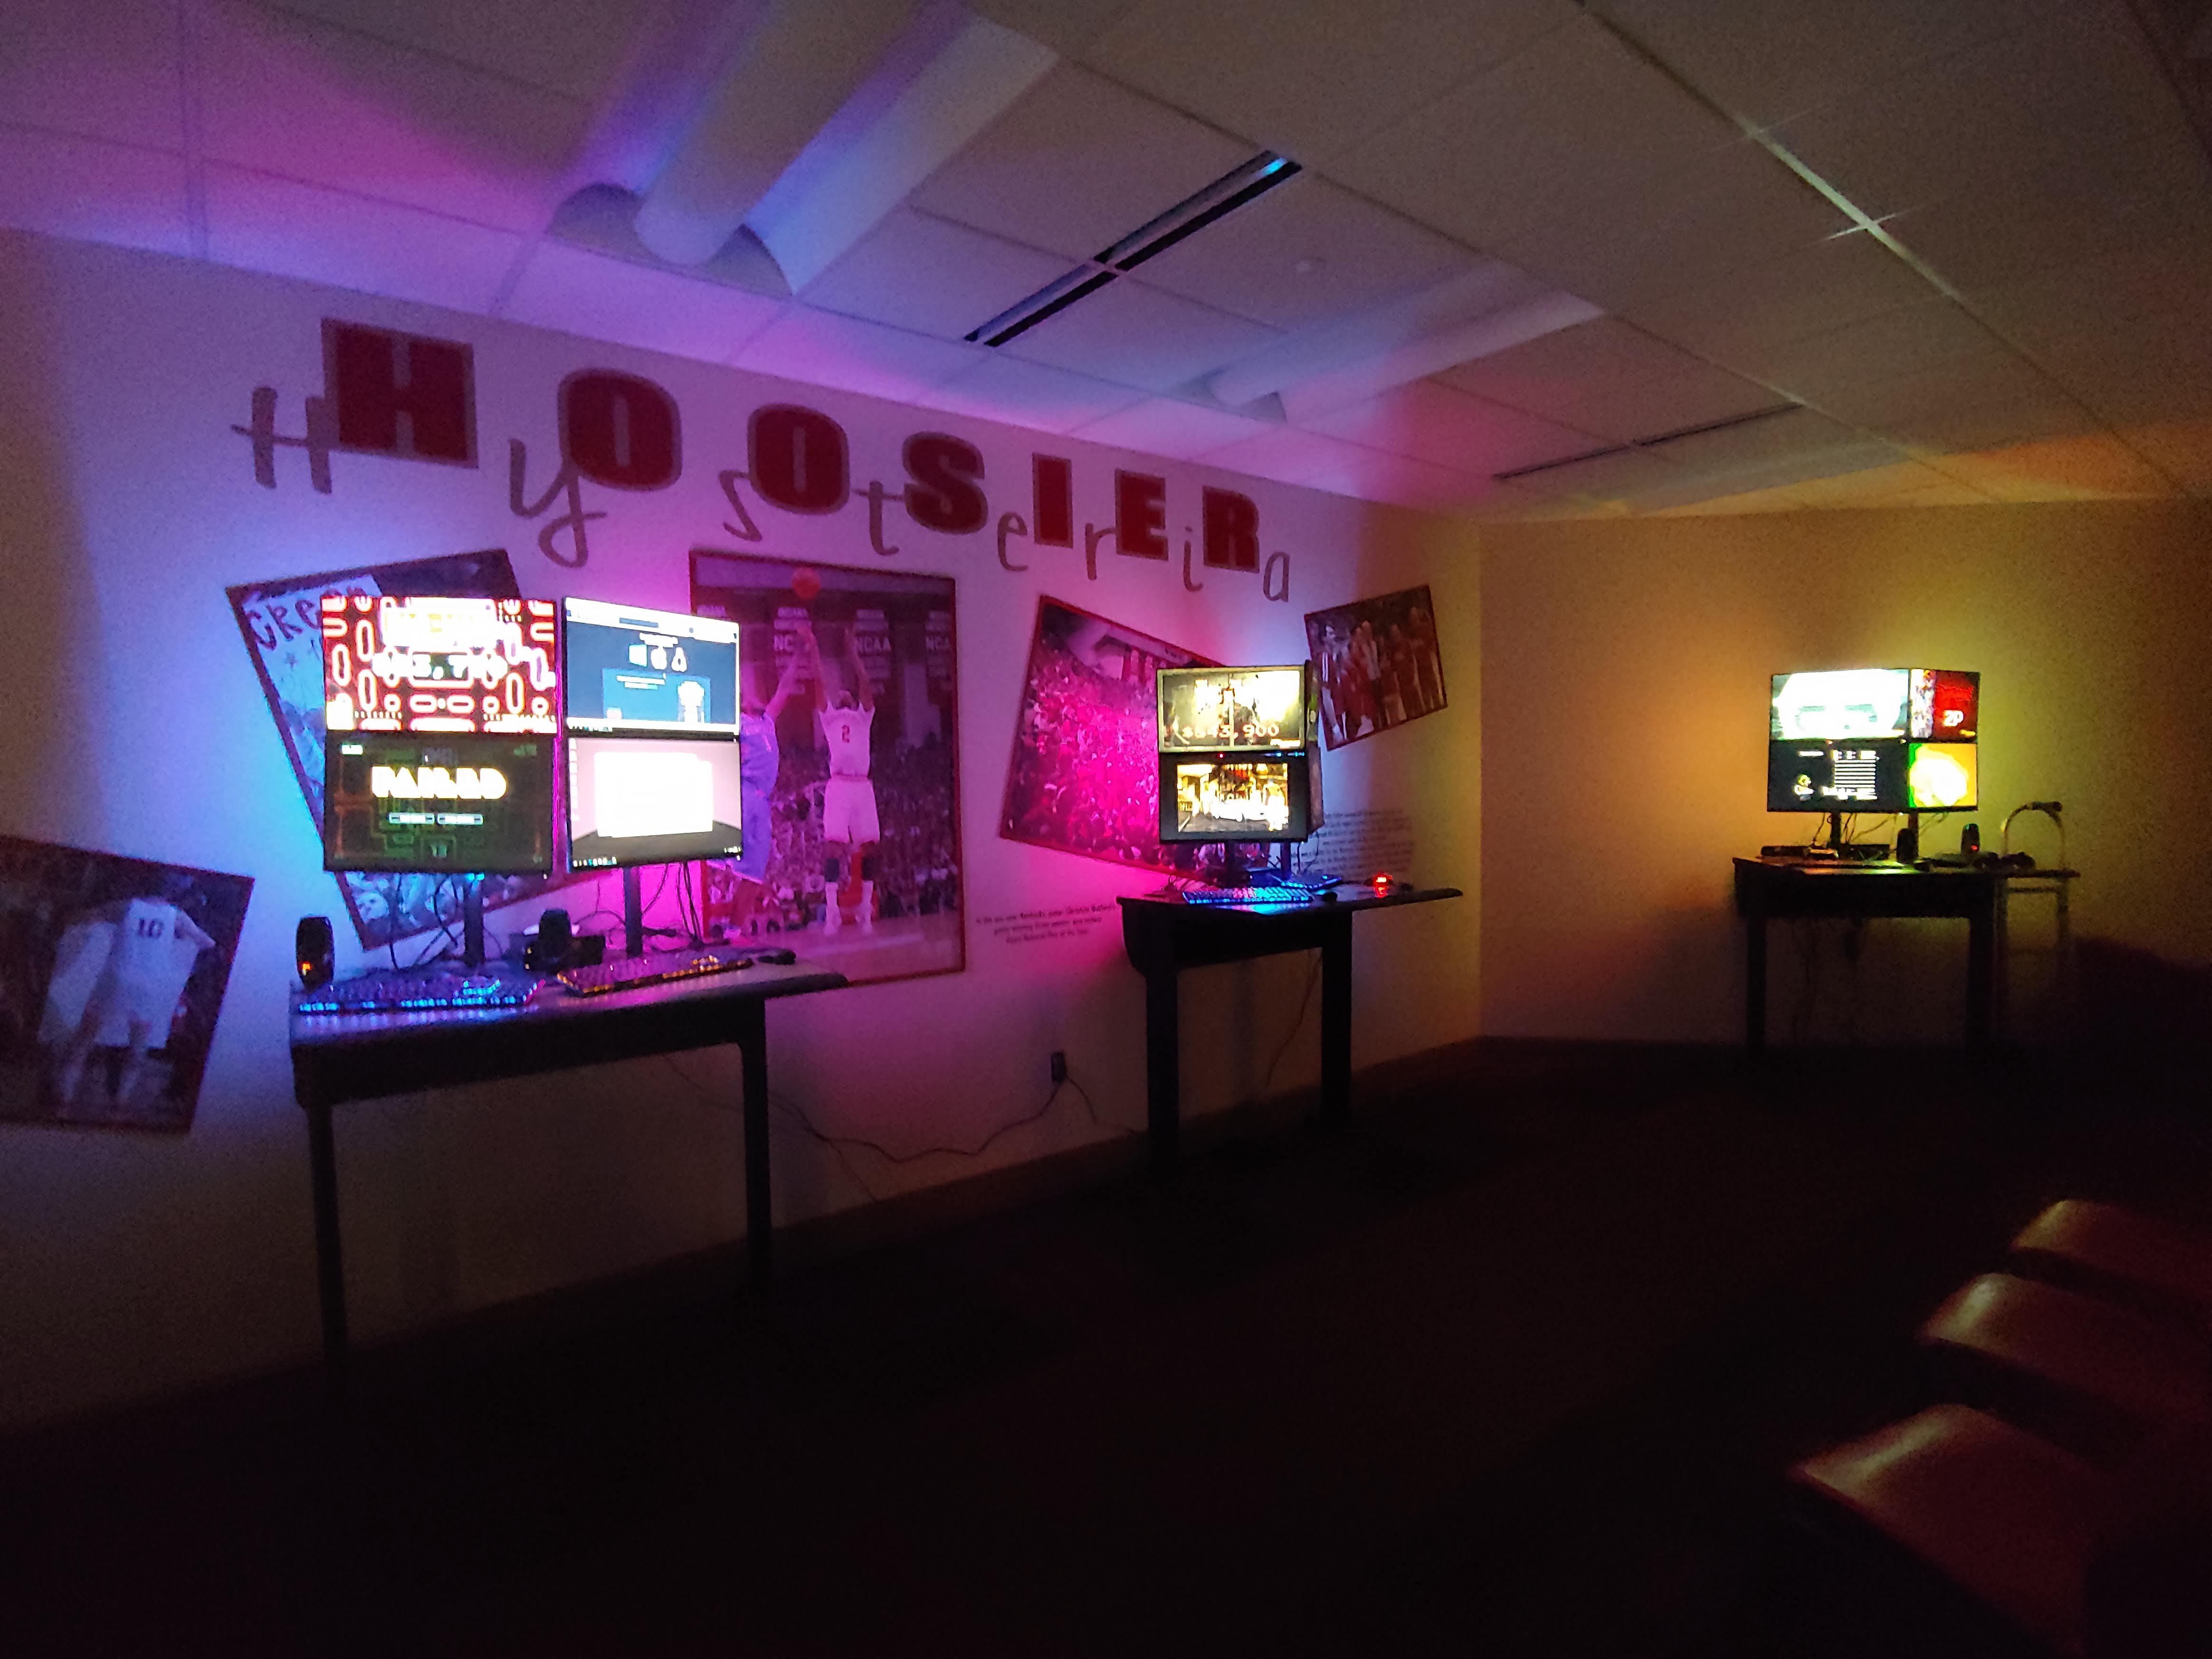 All arcade